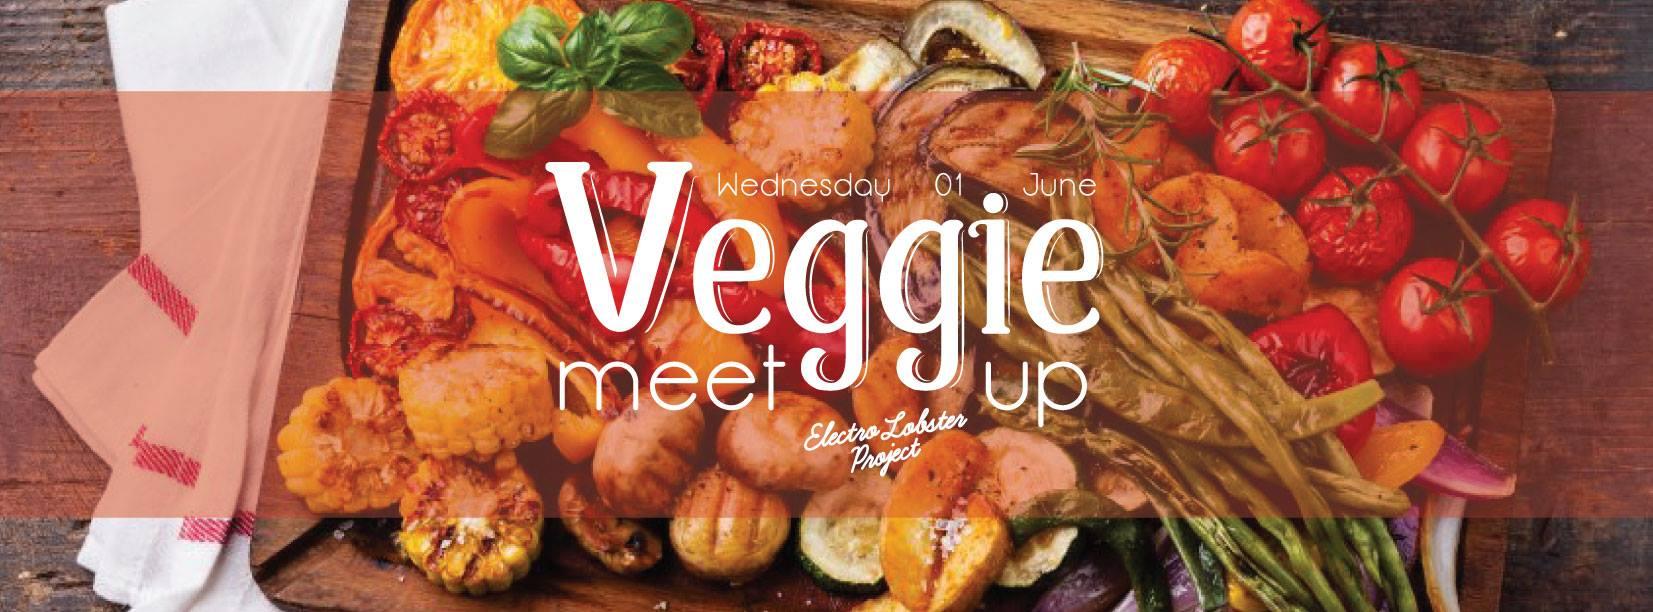 Malta Veggie Meetup June 2016